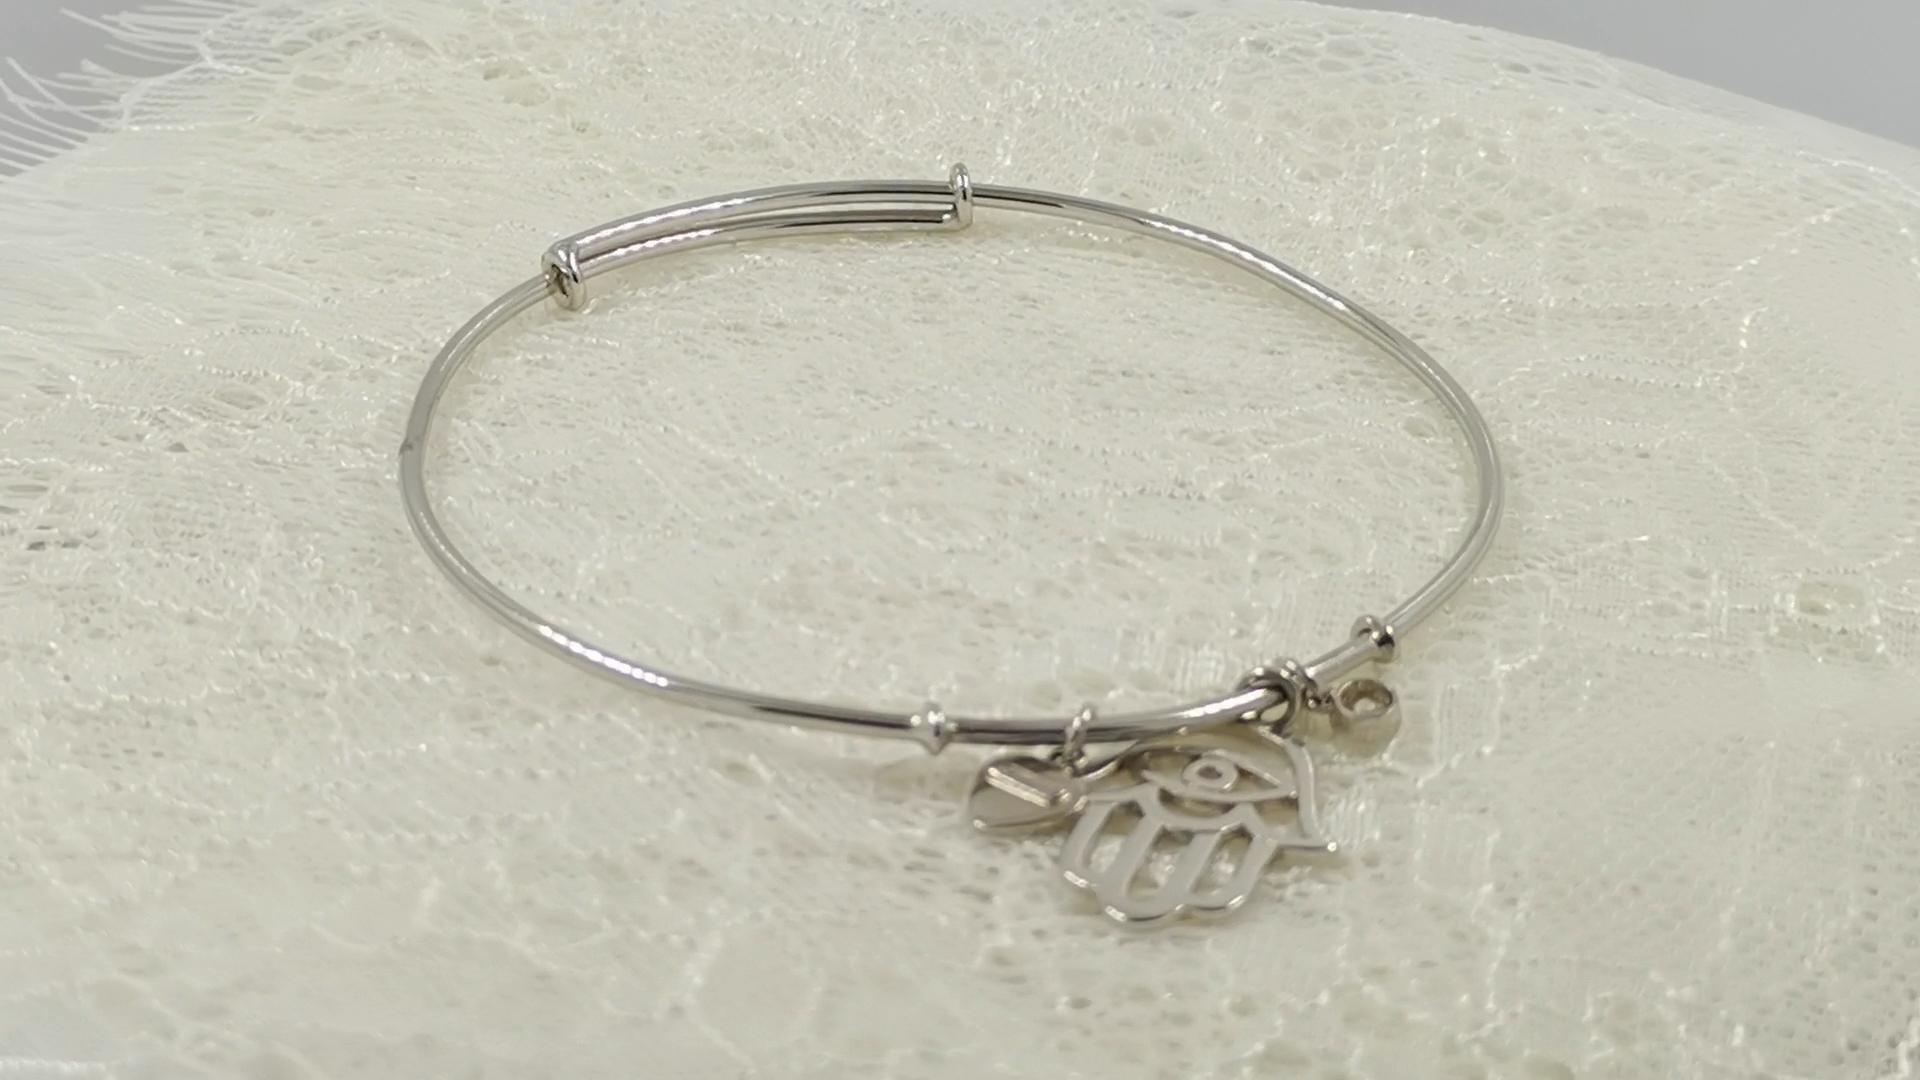 White CZ Jewelry Customize Daily Wearing  Sterling Silver  Charm Women bangle Bracelet